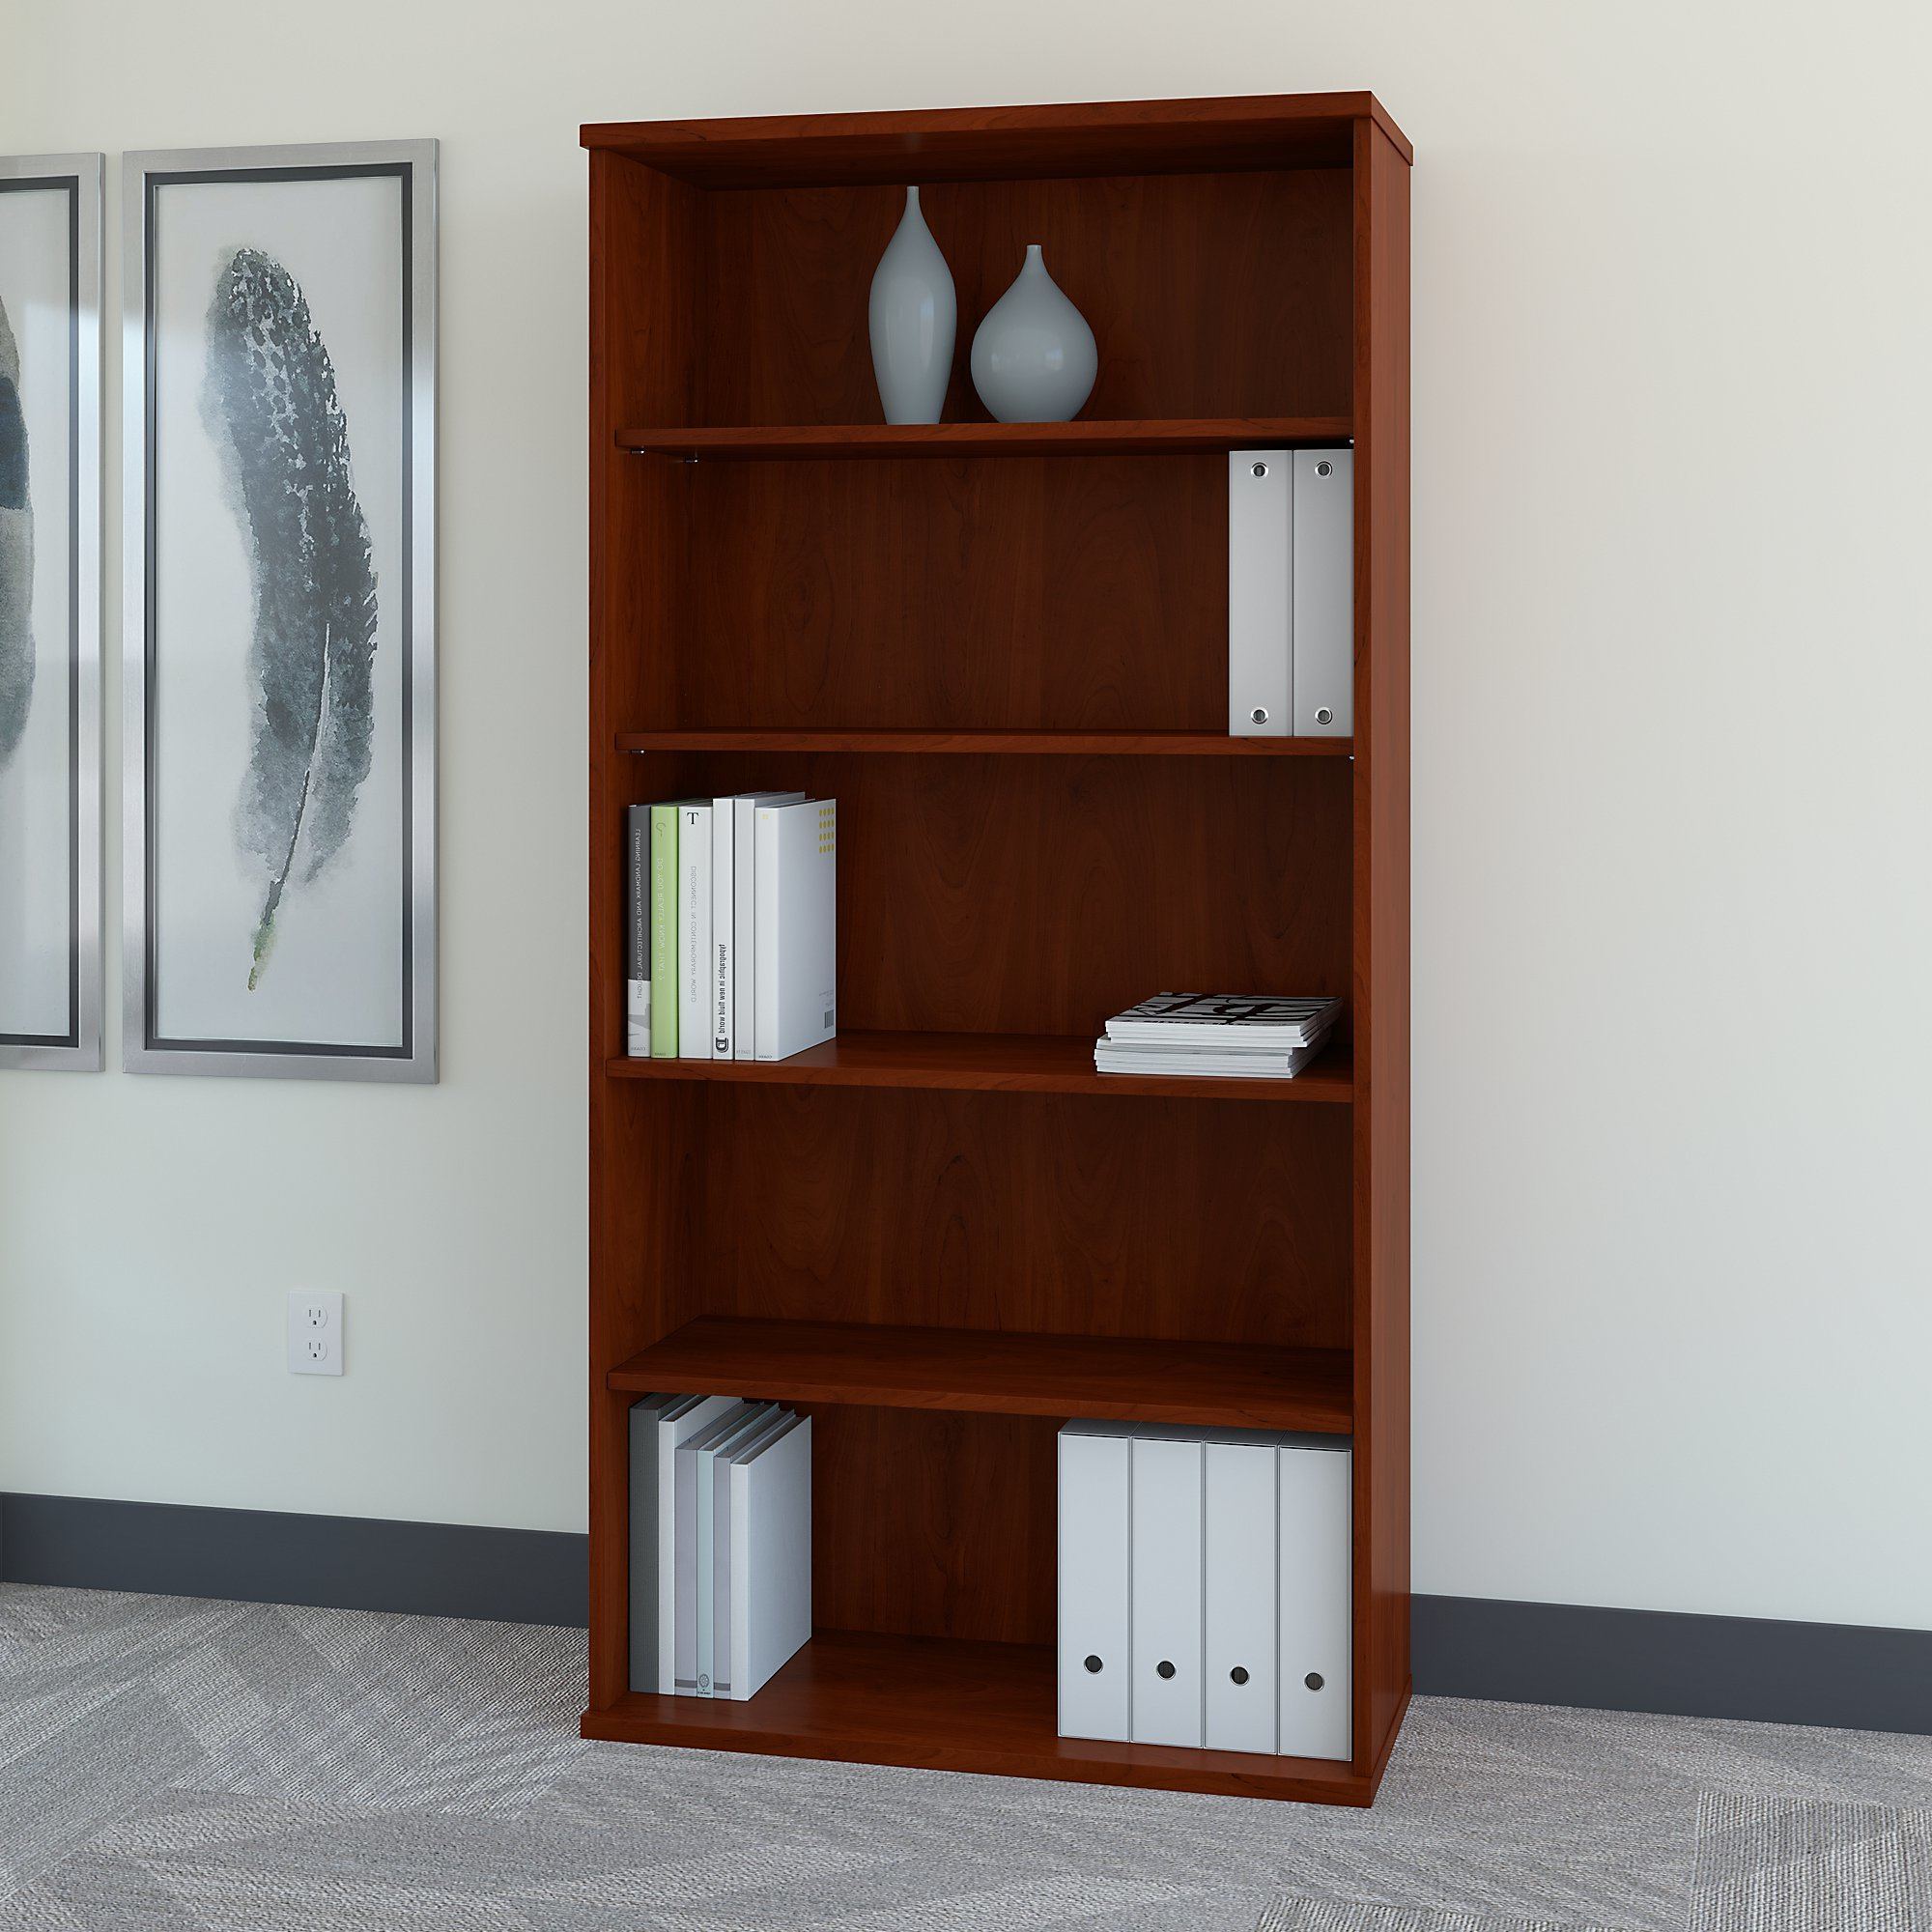 Series C Standard Bookcases In Favorite Bush Business Furniture Series C Standard Bookcase (Gallery 2 of 20)